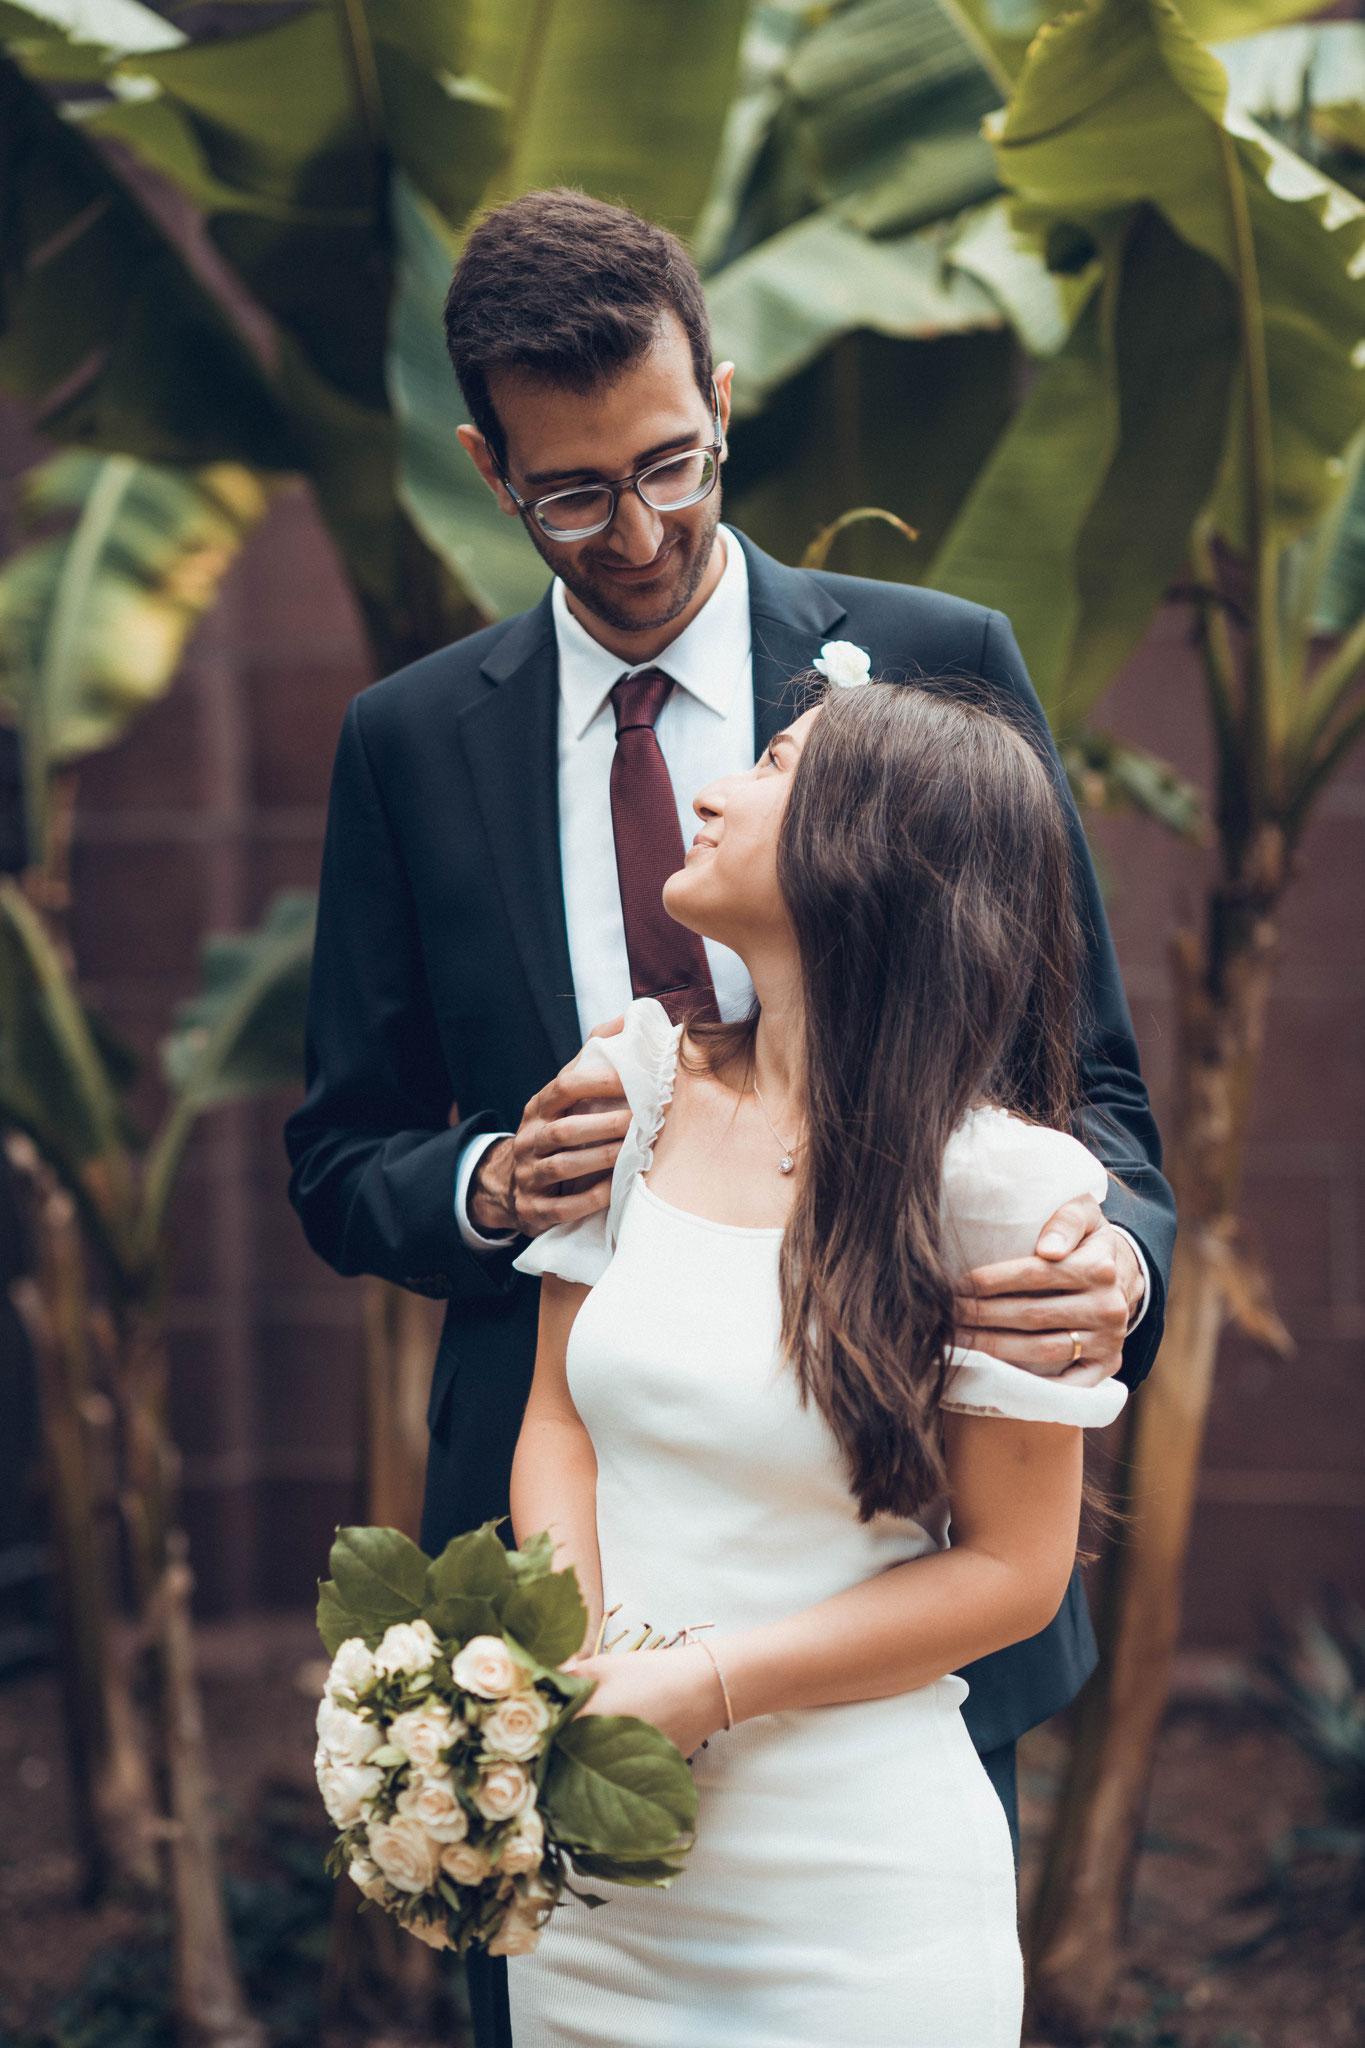 Kurzes Brautpaarshooting am Main nahe des Restaurant Nizza